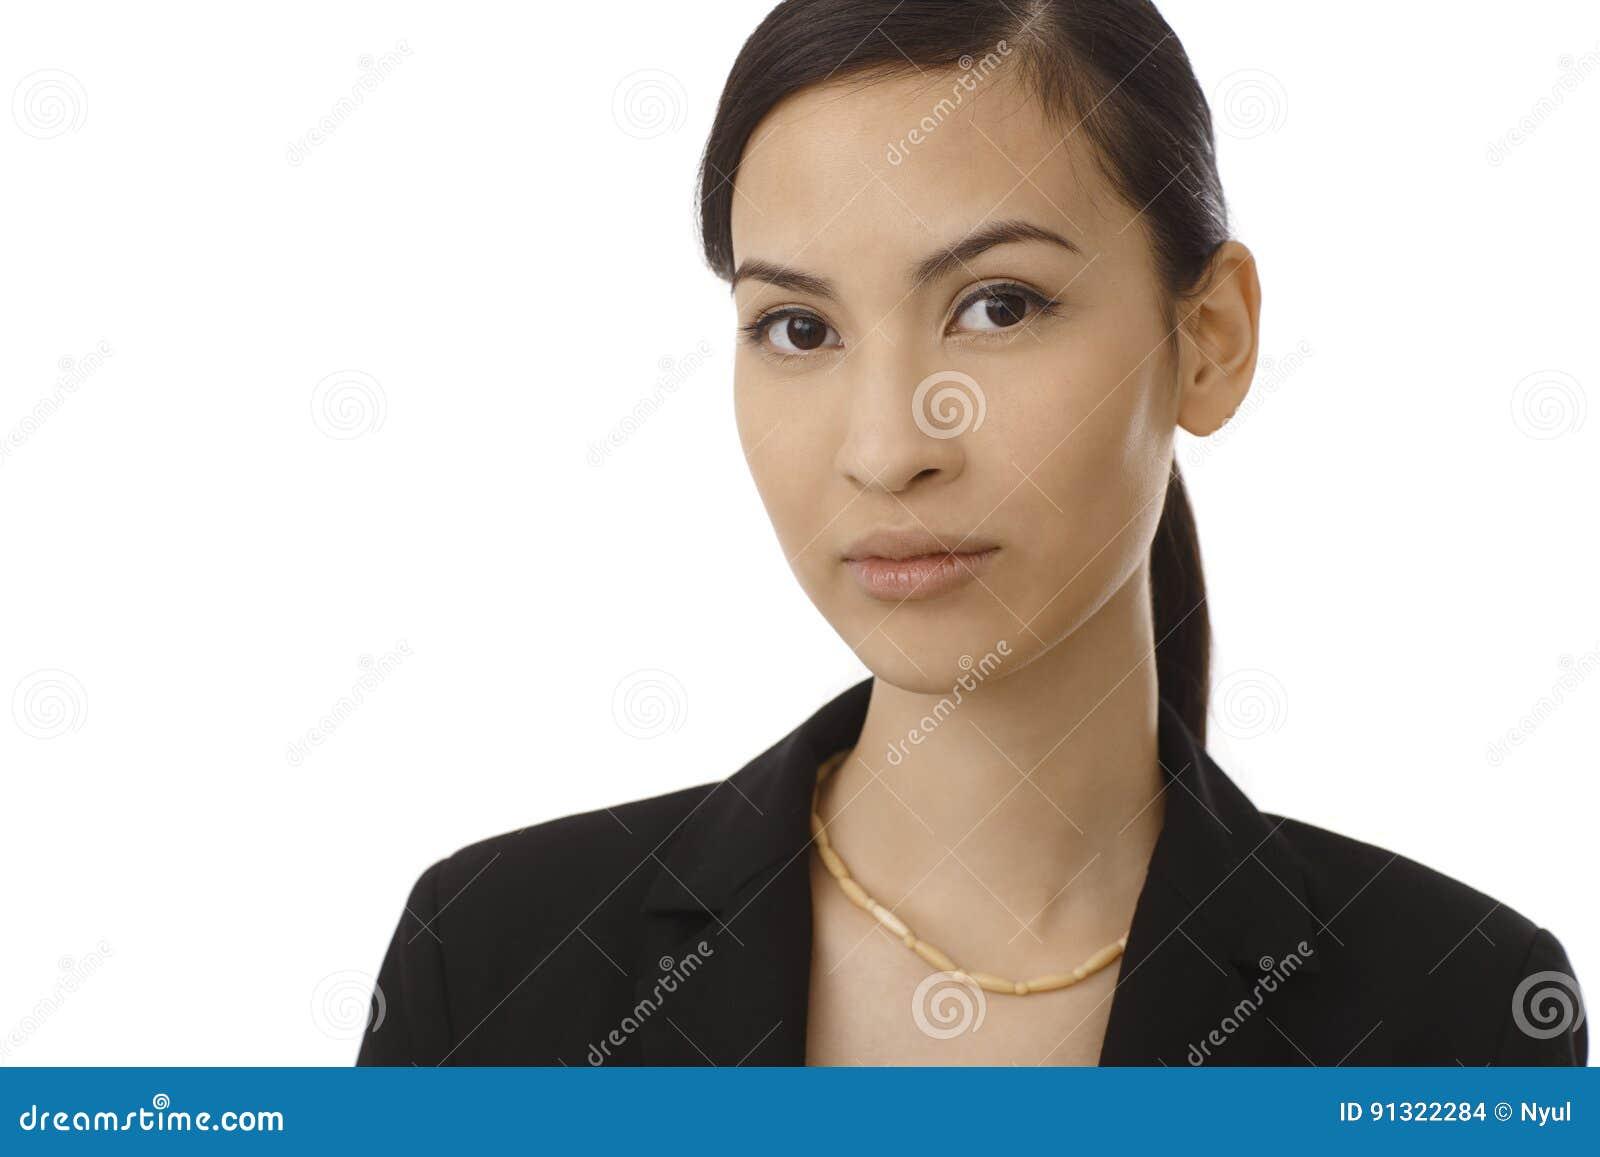 Closeup portrait of beautiful Asian woman